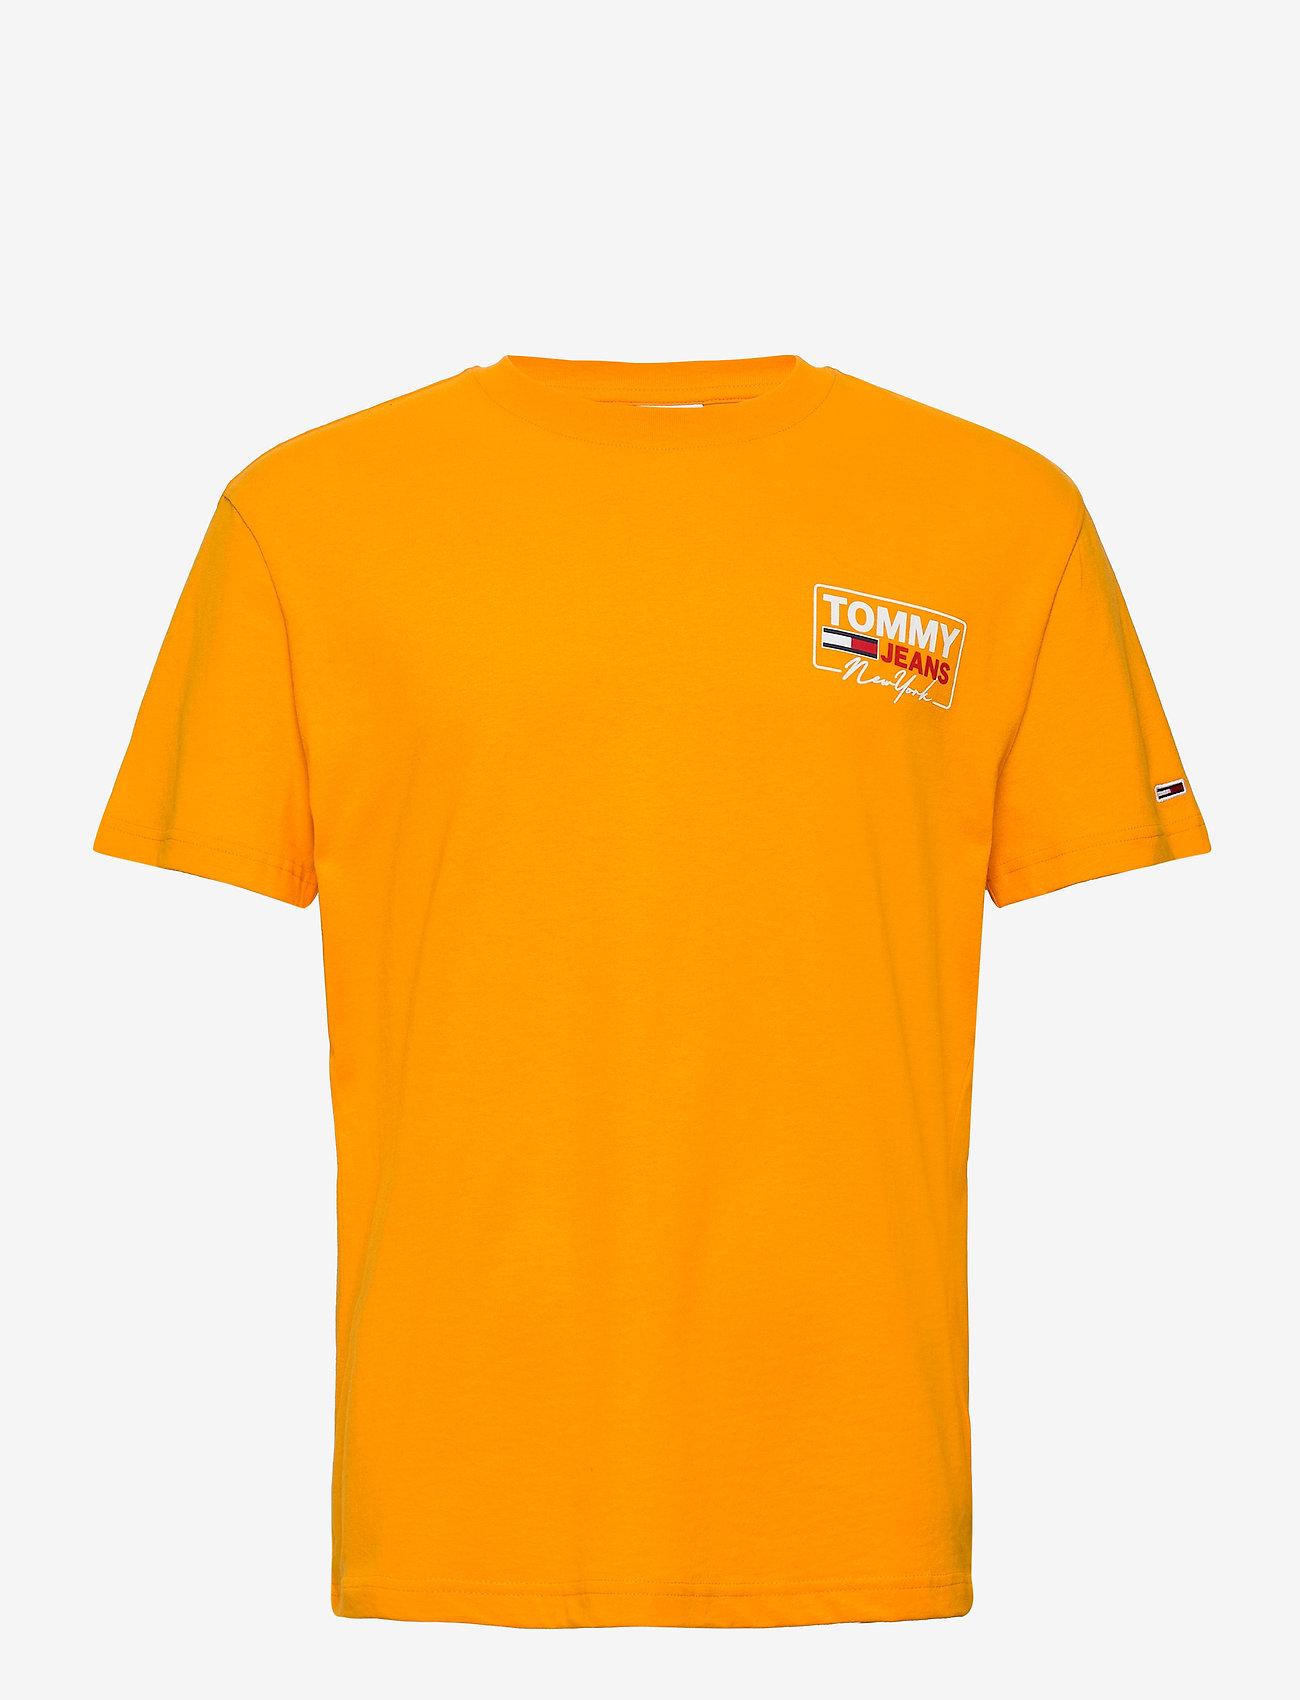 Tommy Jeans - TJM NY SCRIPT BOX BACK LOGO TEE - korte mouwen - florida orange - 0